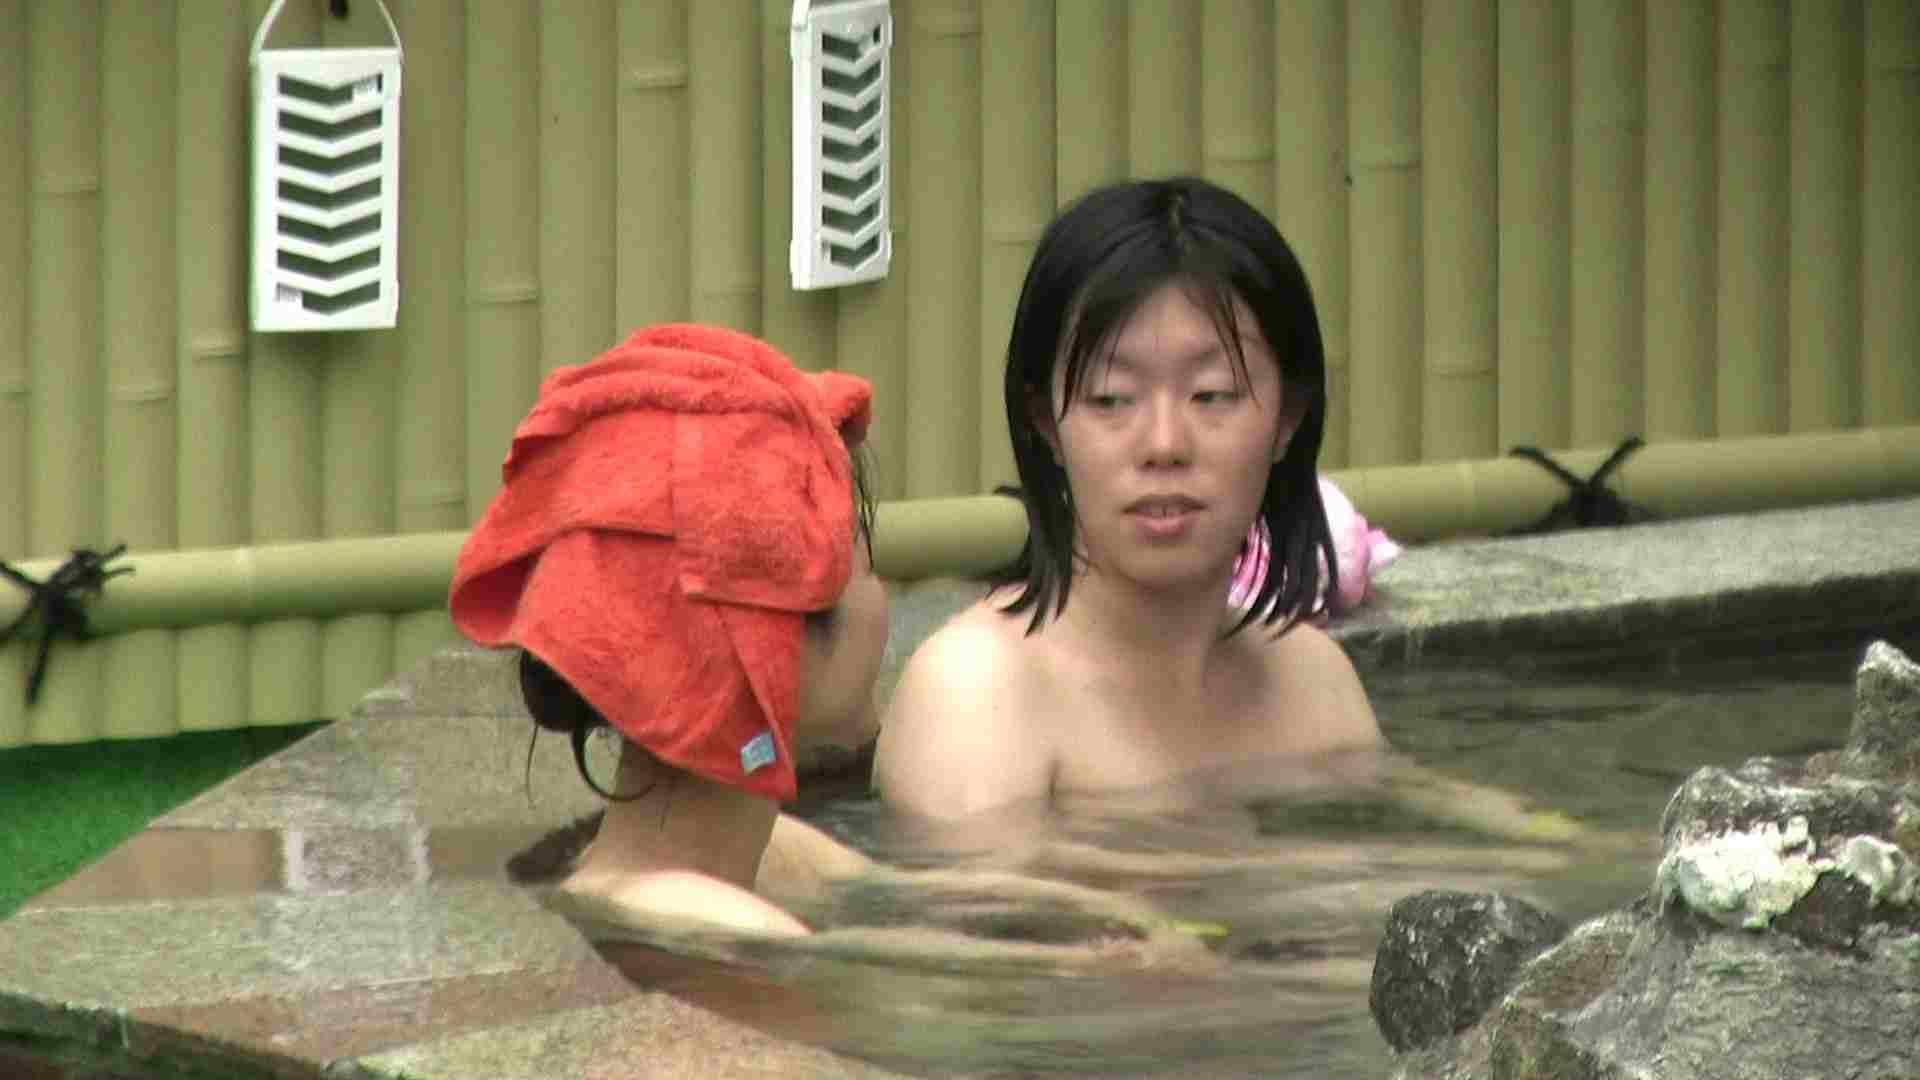 Aquaな露天風呂Vol.187 盗撮  63連発 9